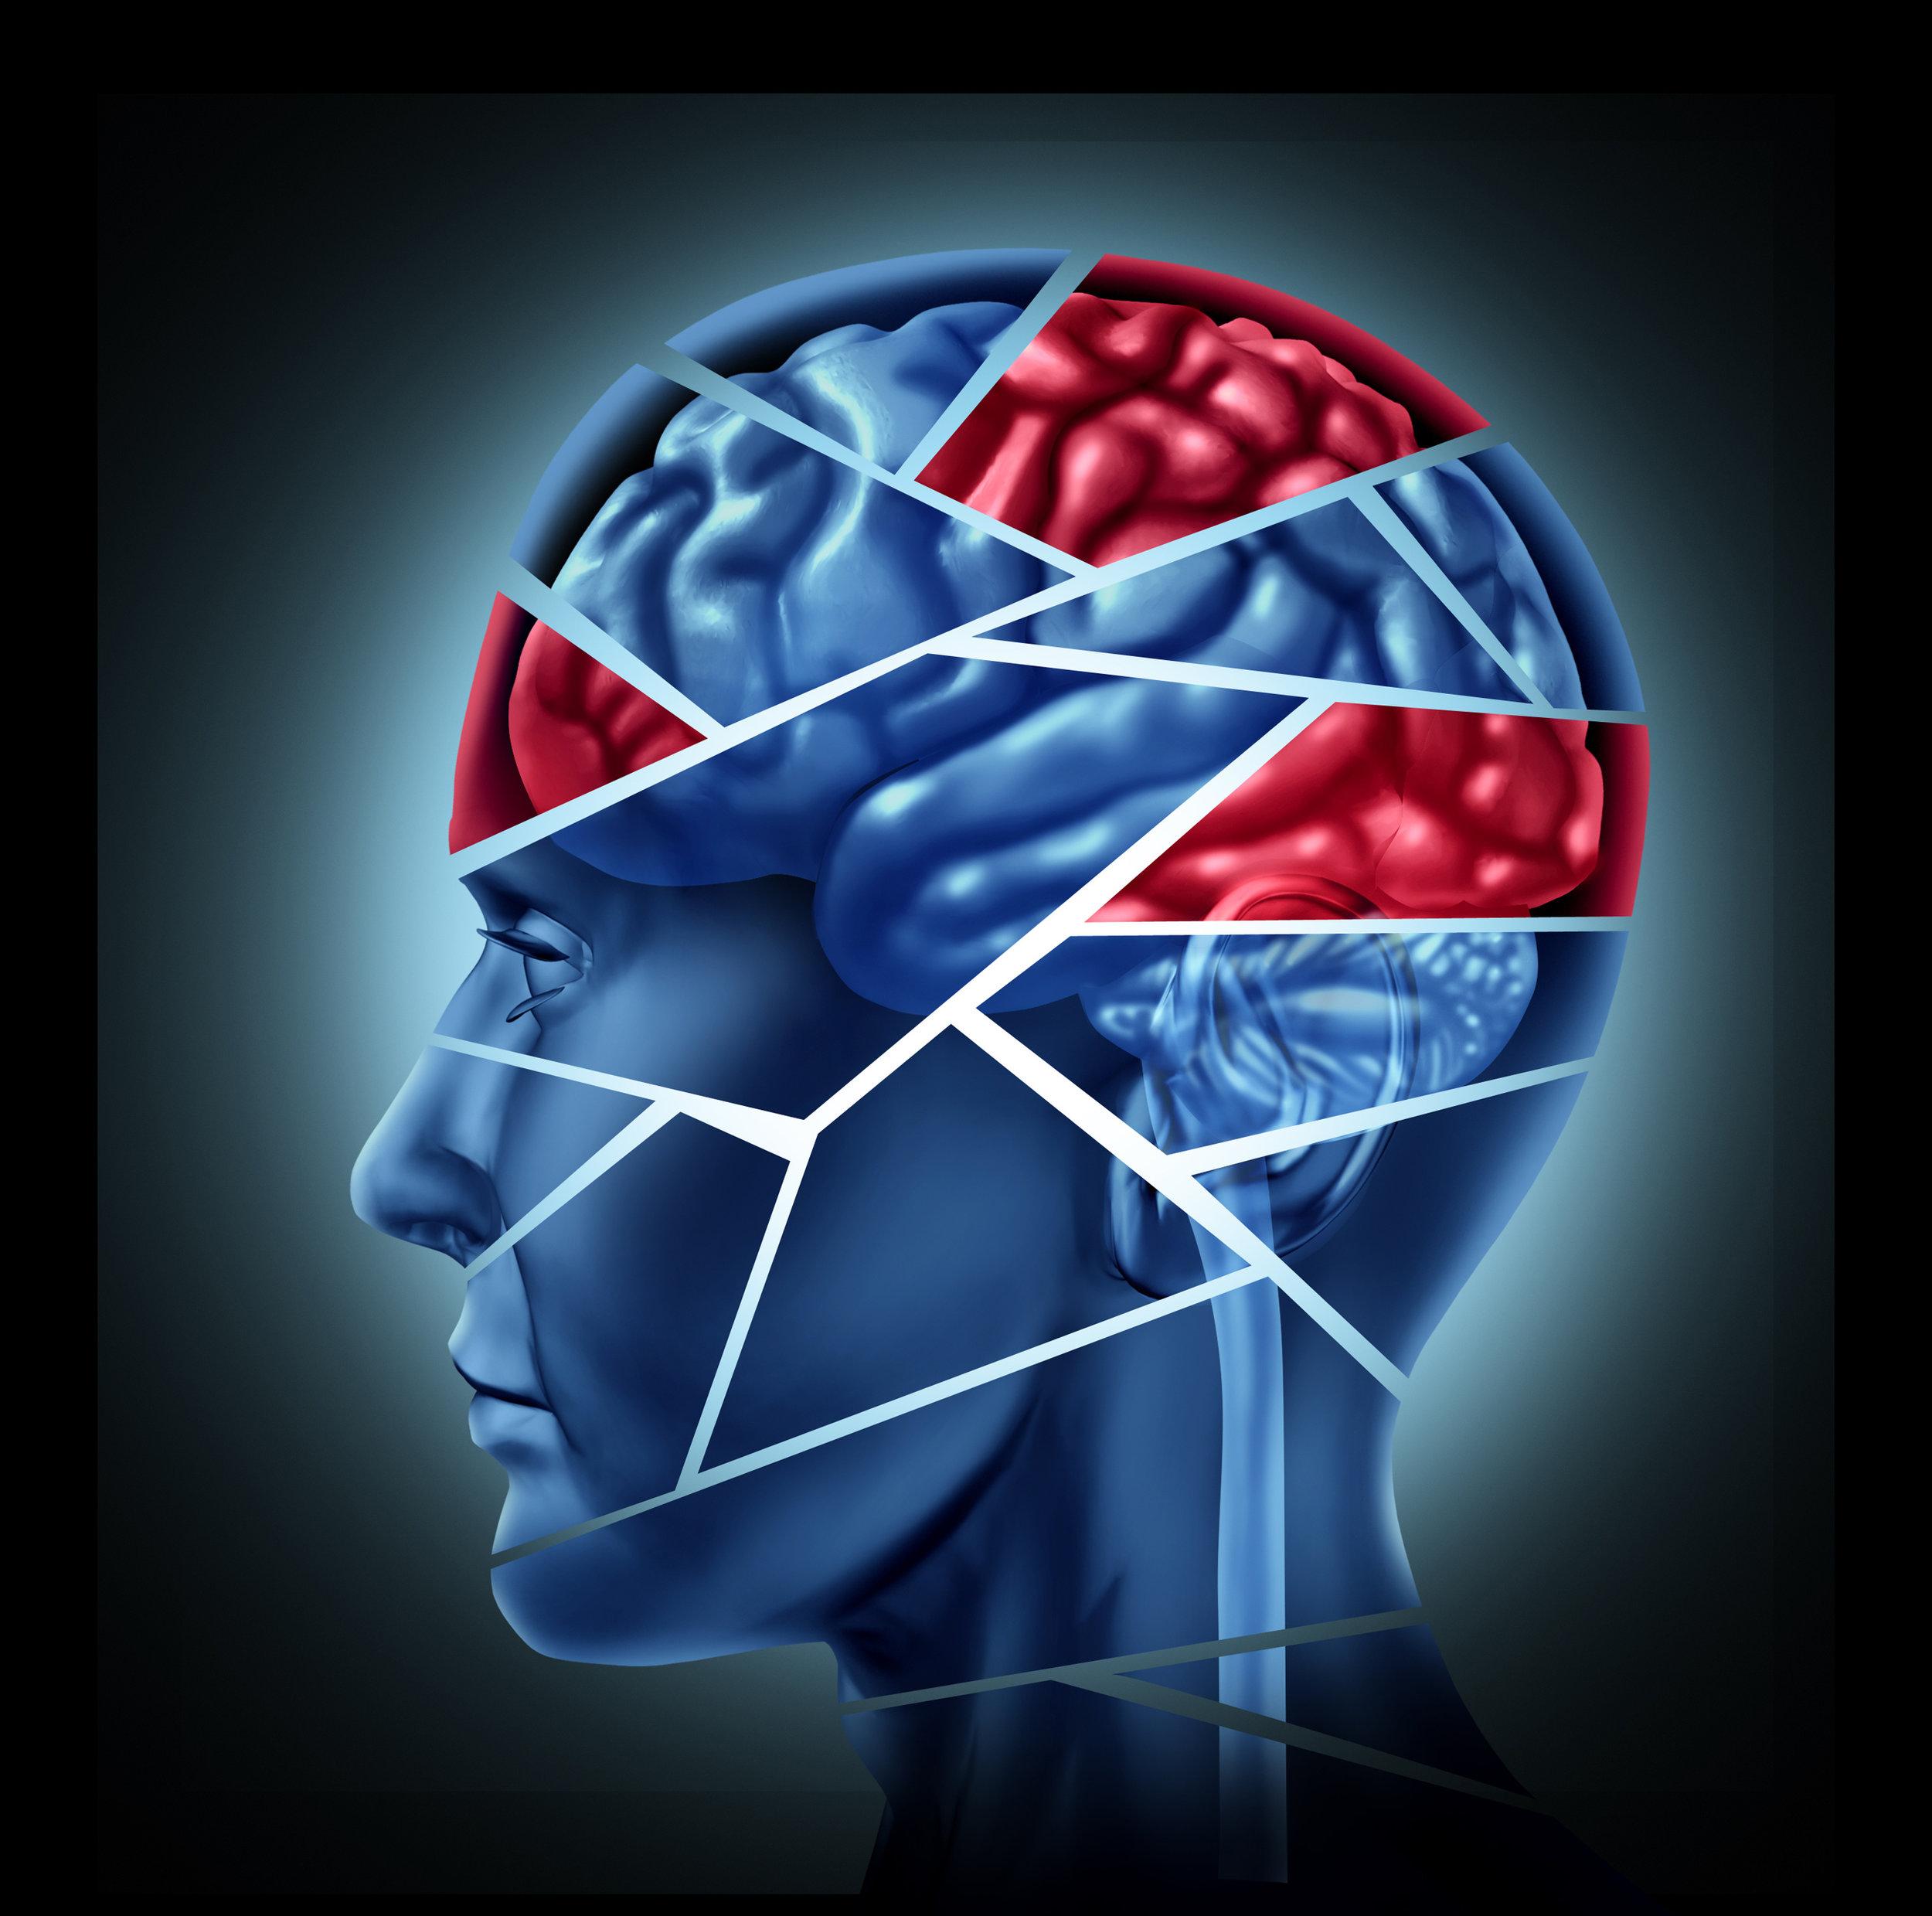 Adobe_Brain Injury 5.jpeg